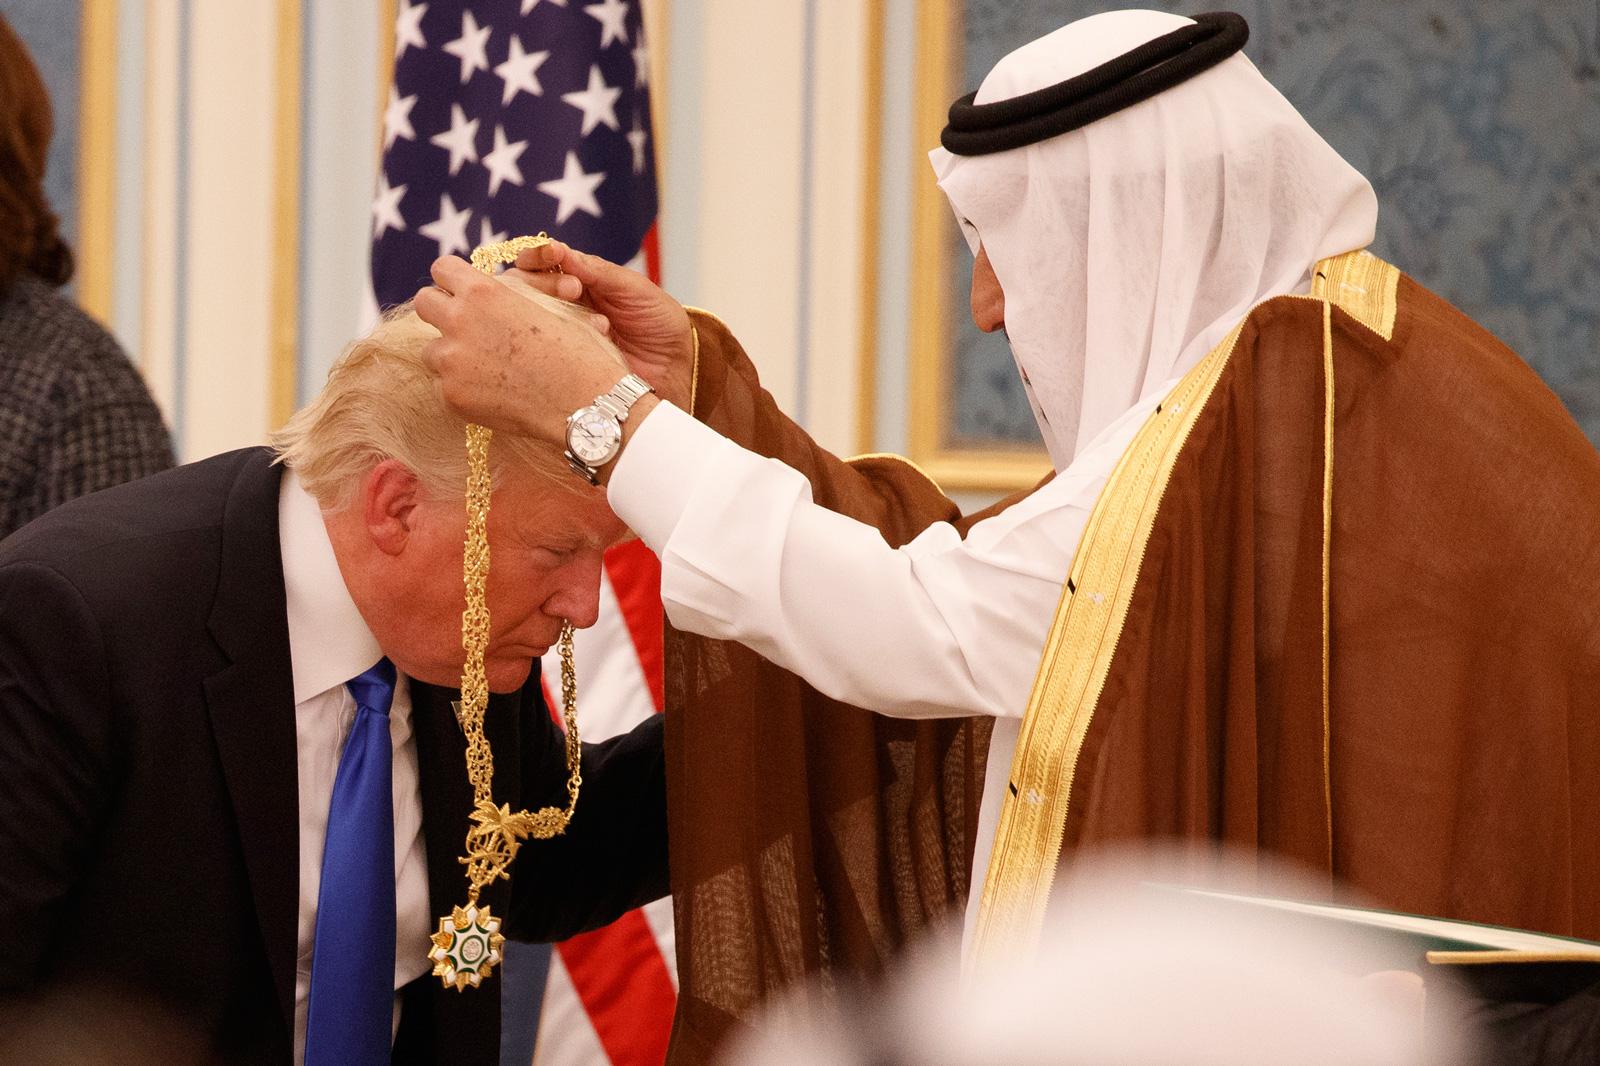 Saudi King Salman presenting President Donald Trump with the highest civilian honor, the Collar of Abdulaziz Al Saud, at the Royal Court Palace, Riyadh, Saudi Arabia, May 20, 2017